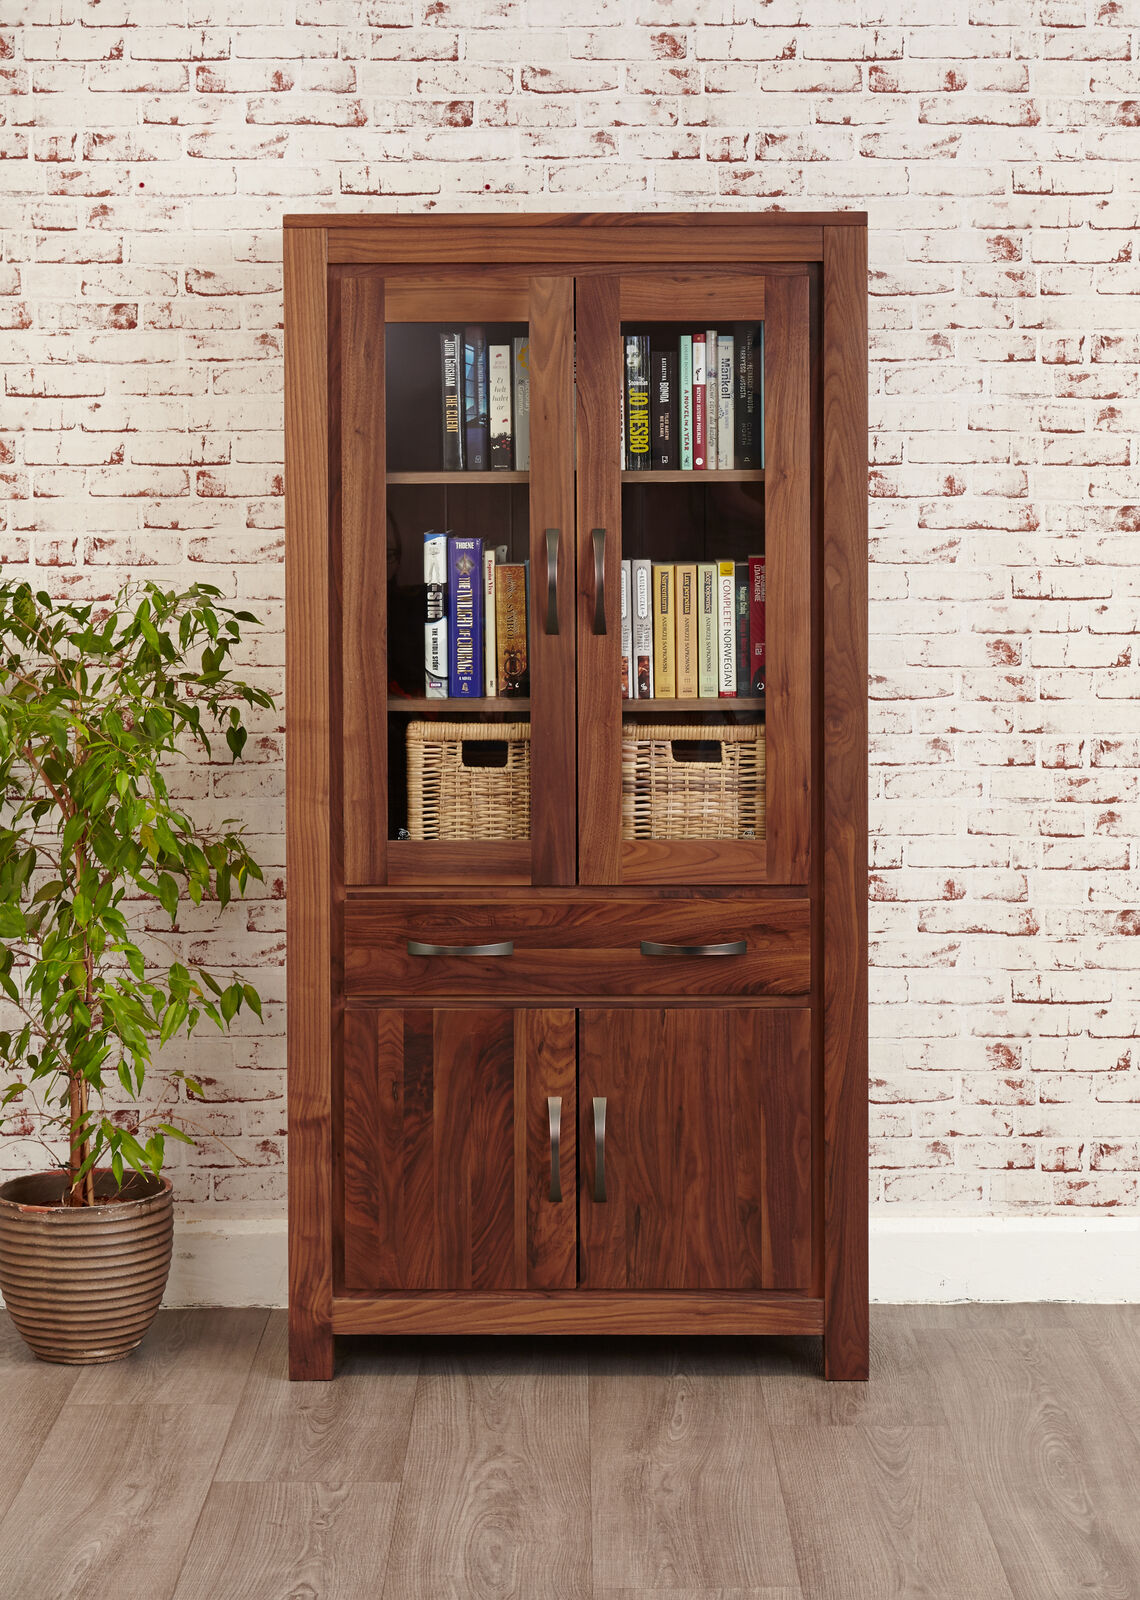 Mayan Solid Walnut Dark Wood Large Glazed Bookcase Display Cabinet With Storage